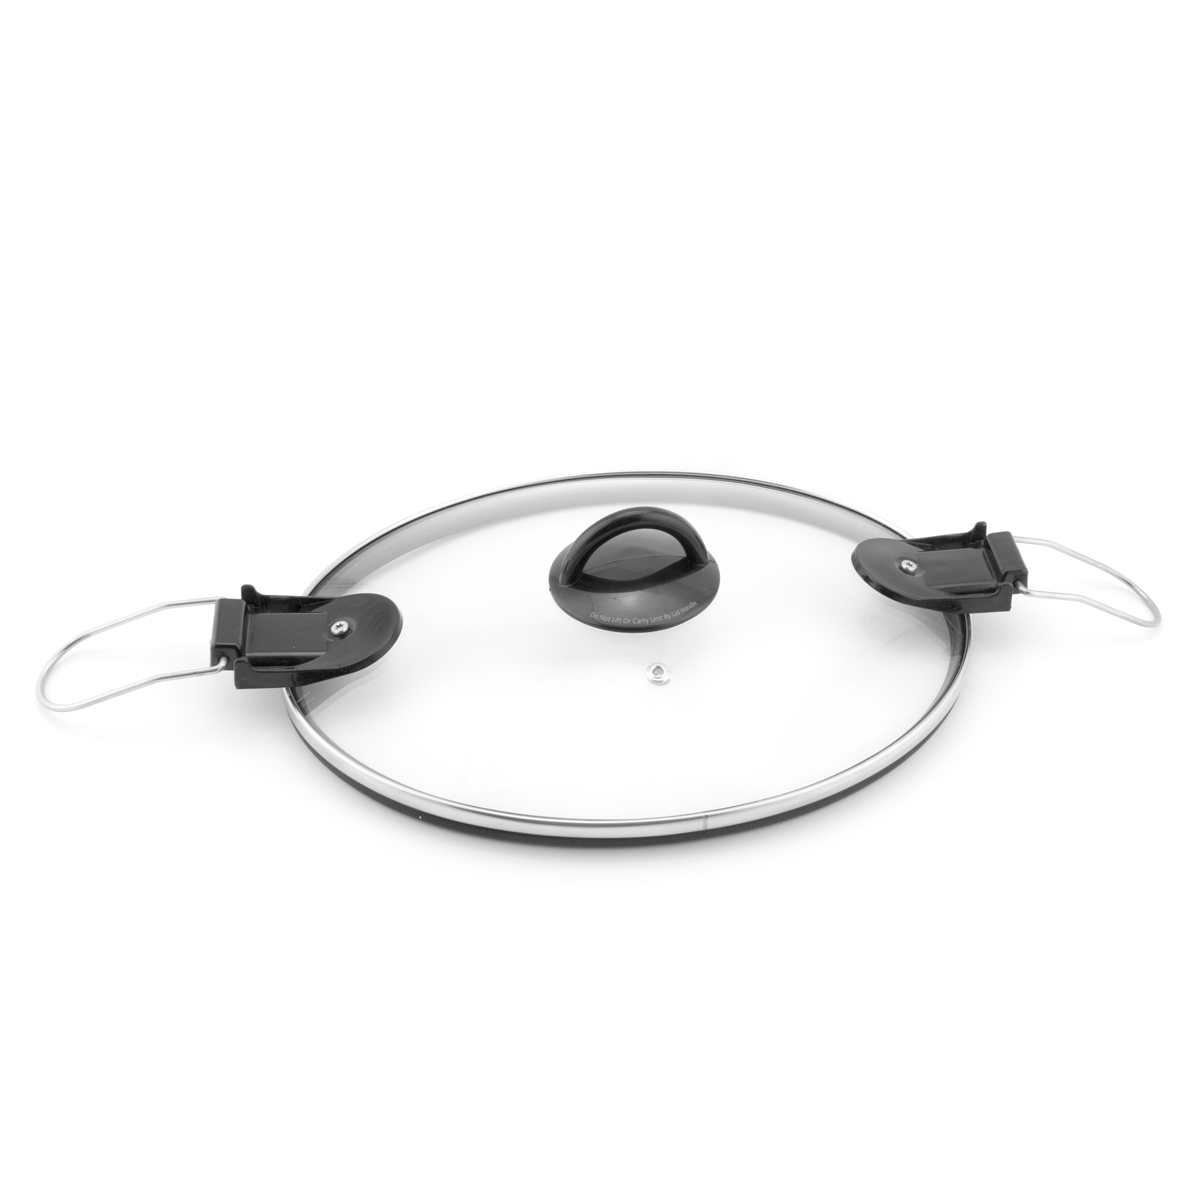 Crock-Pot® Cook & Carry™ 5 quart Replacement Lid | Crock-Pot® Canada